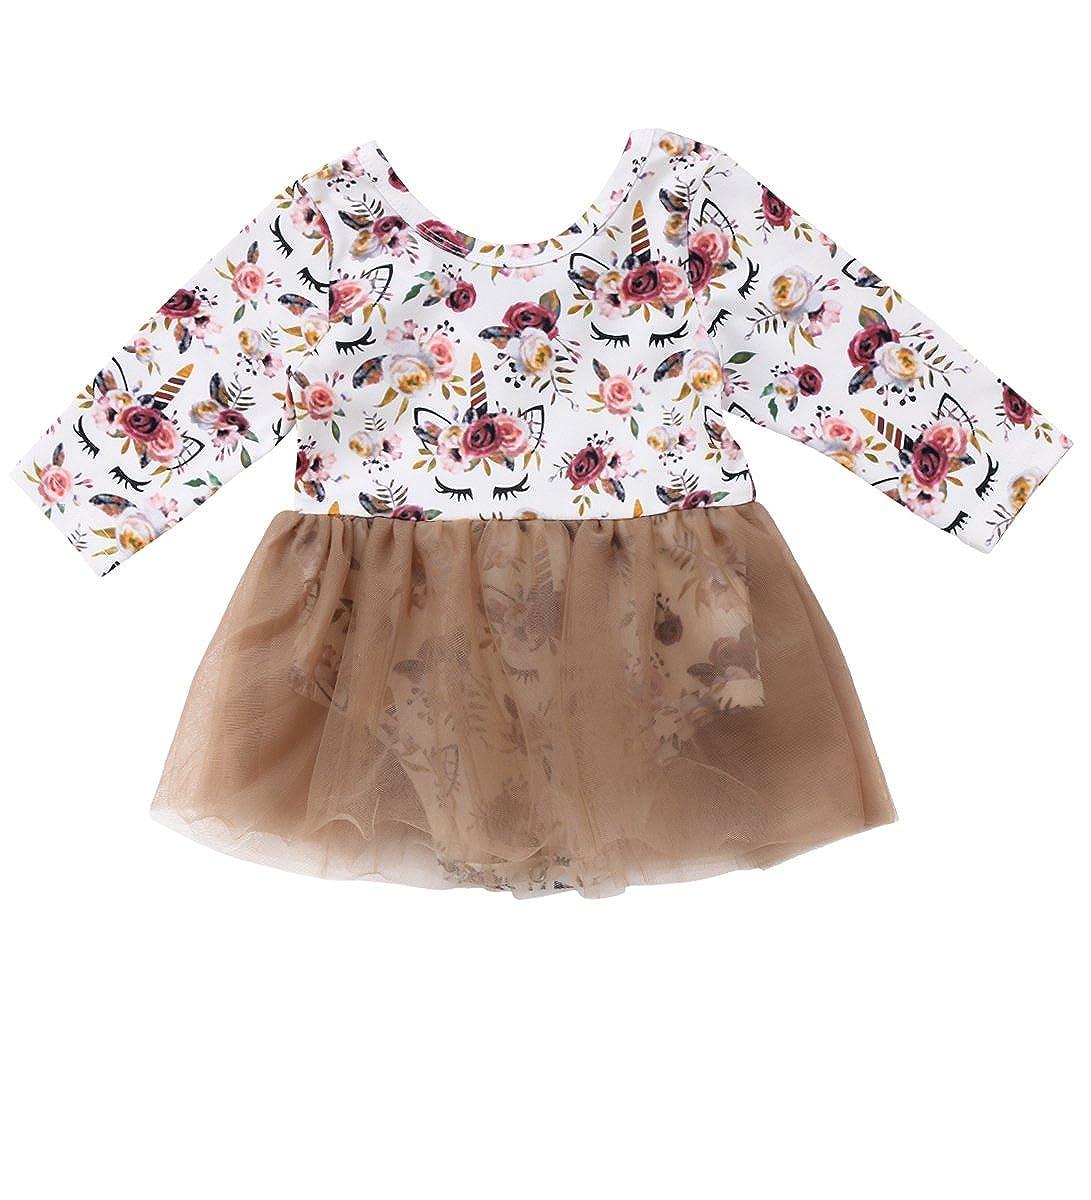 043e15e04 Amazon.com: Newborn Baby Girls Unicorn Floral Romper Tutu Dress Outfit  Clothing: Clothing